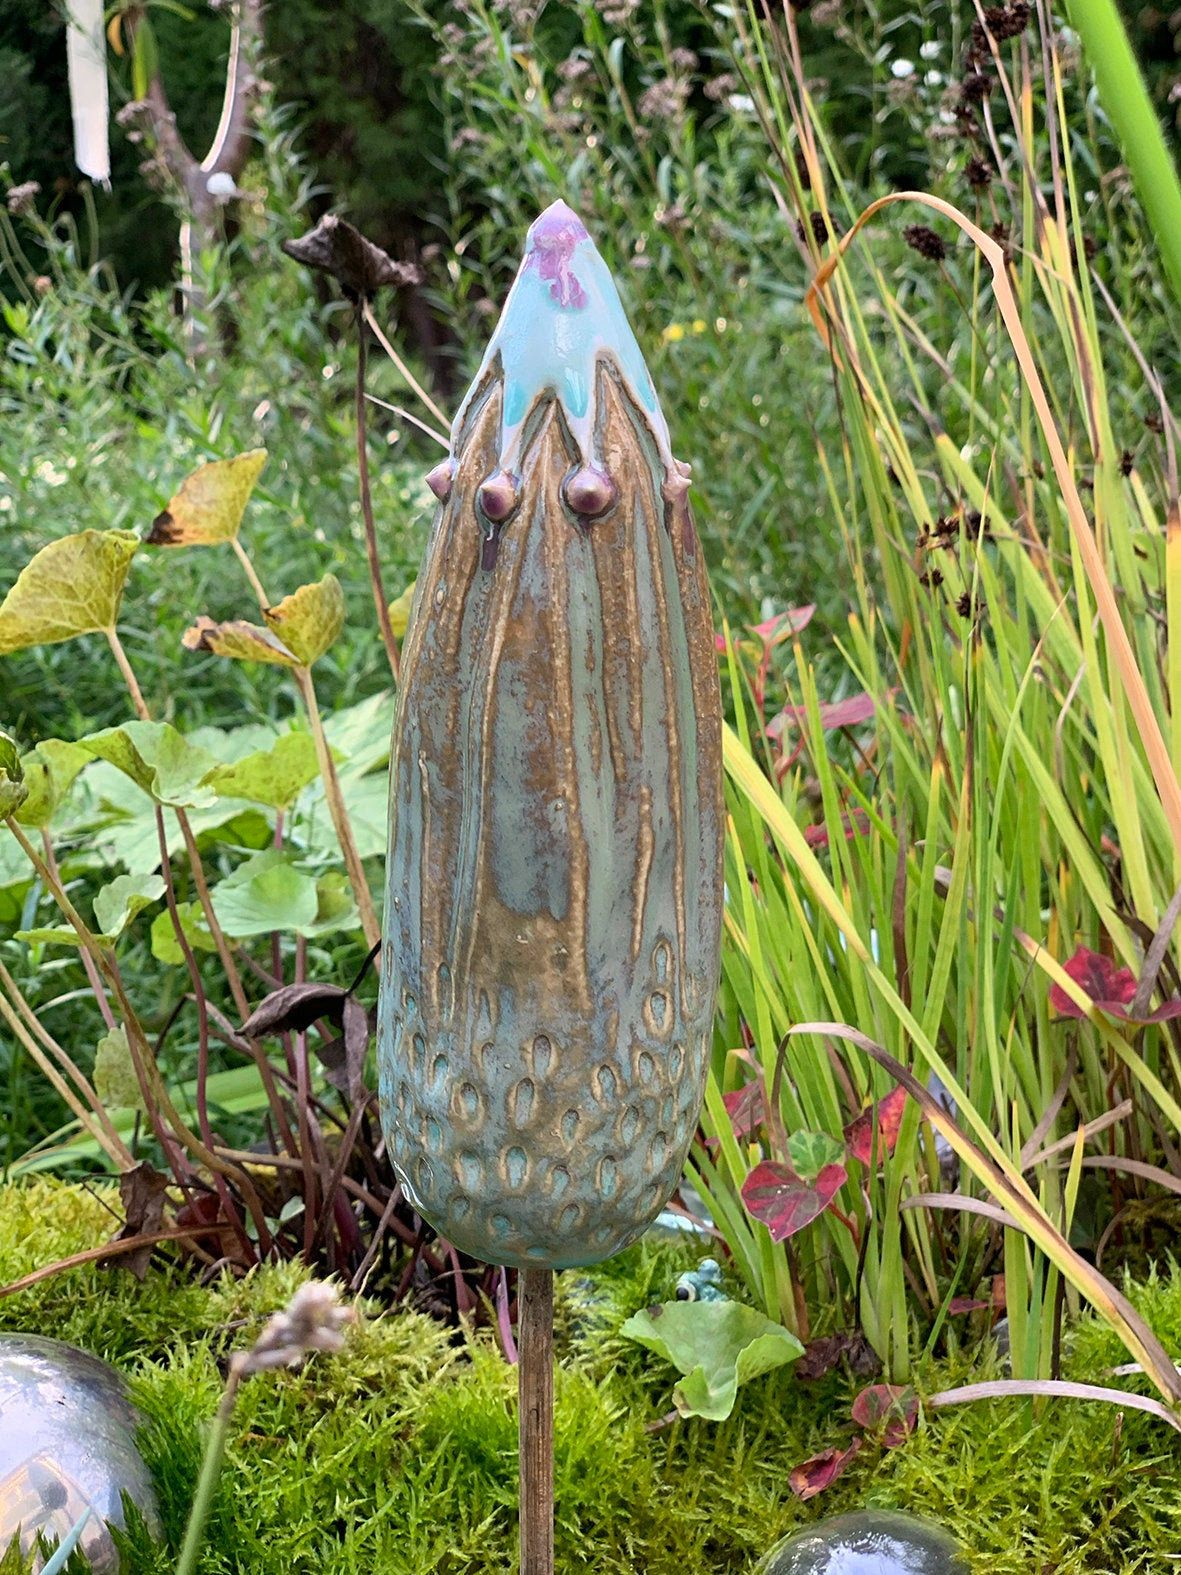 Blütenknospe aus Keramik | Beetstecker Knospe | Steele | Gartenstecker | Blumenstecker | Gartenkeramik | Gartenkunst | Keramikstecker